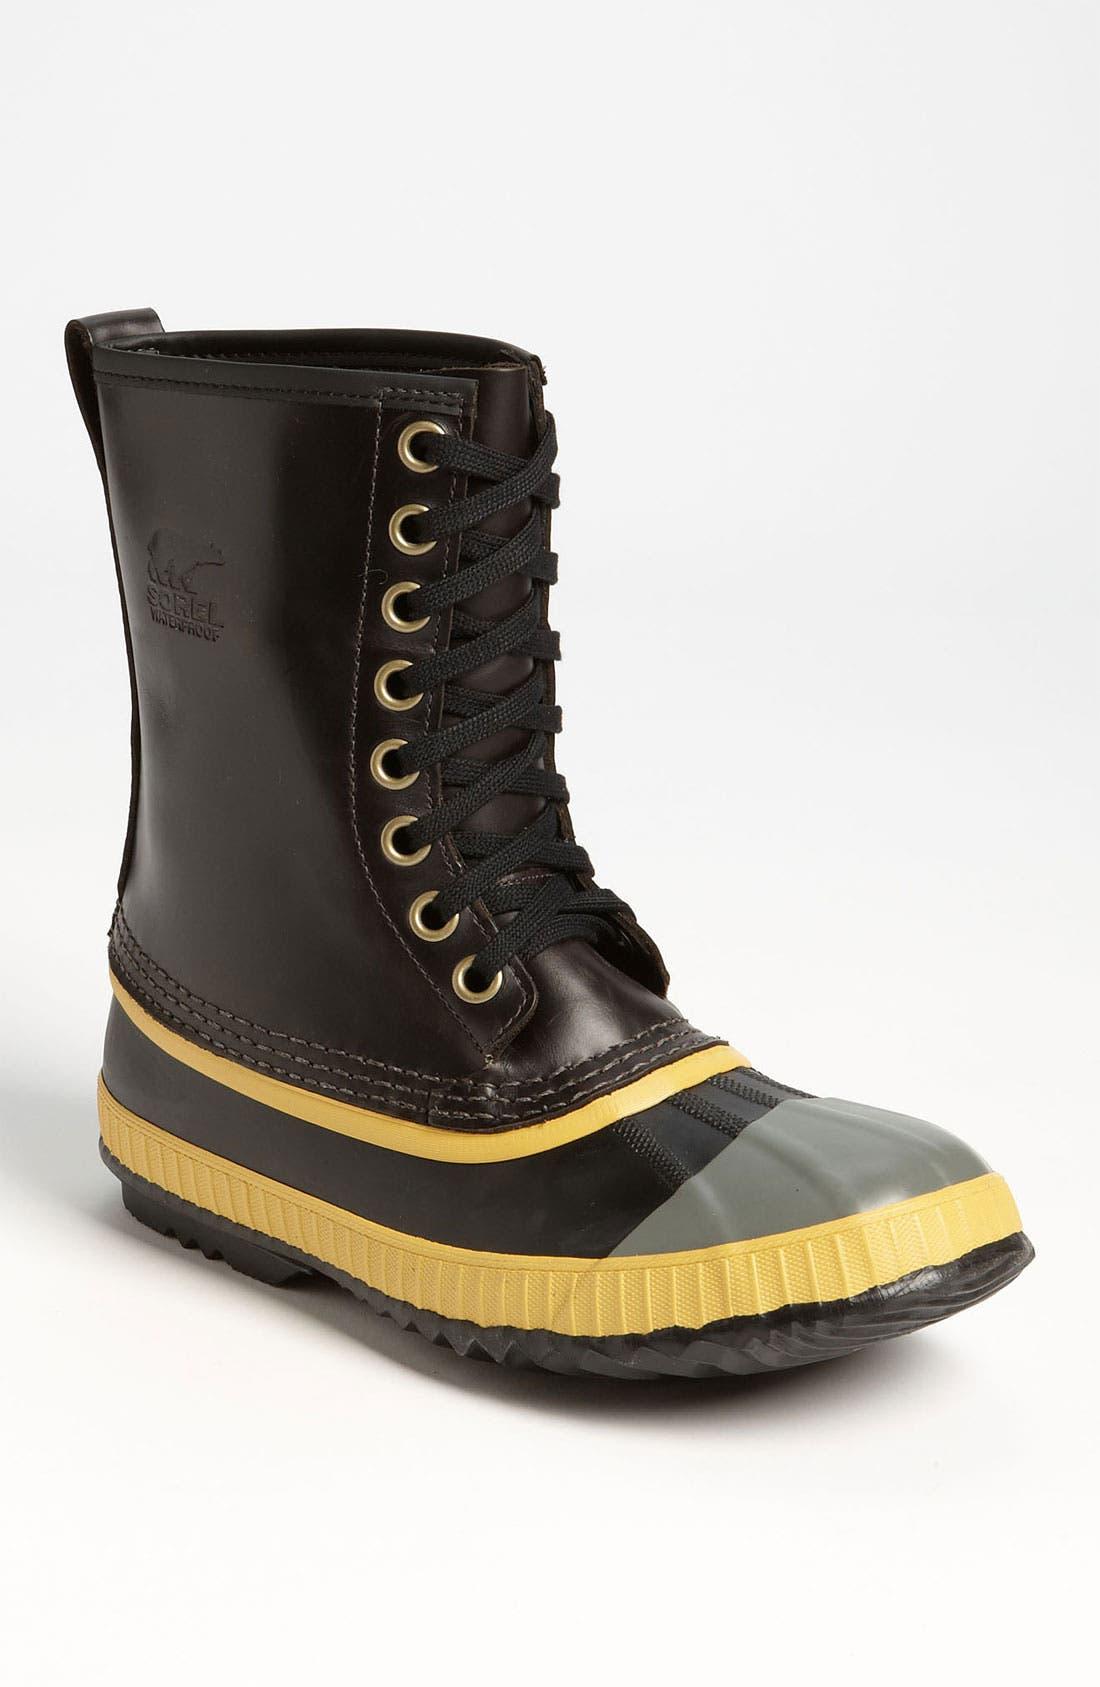 Alternate Image 1 Selected - SOREL 'Sentry' Boot